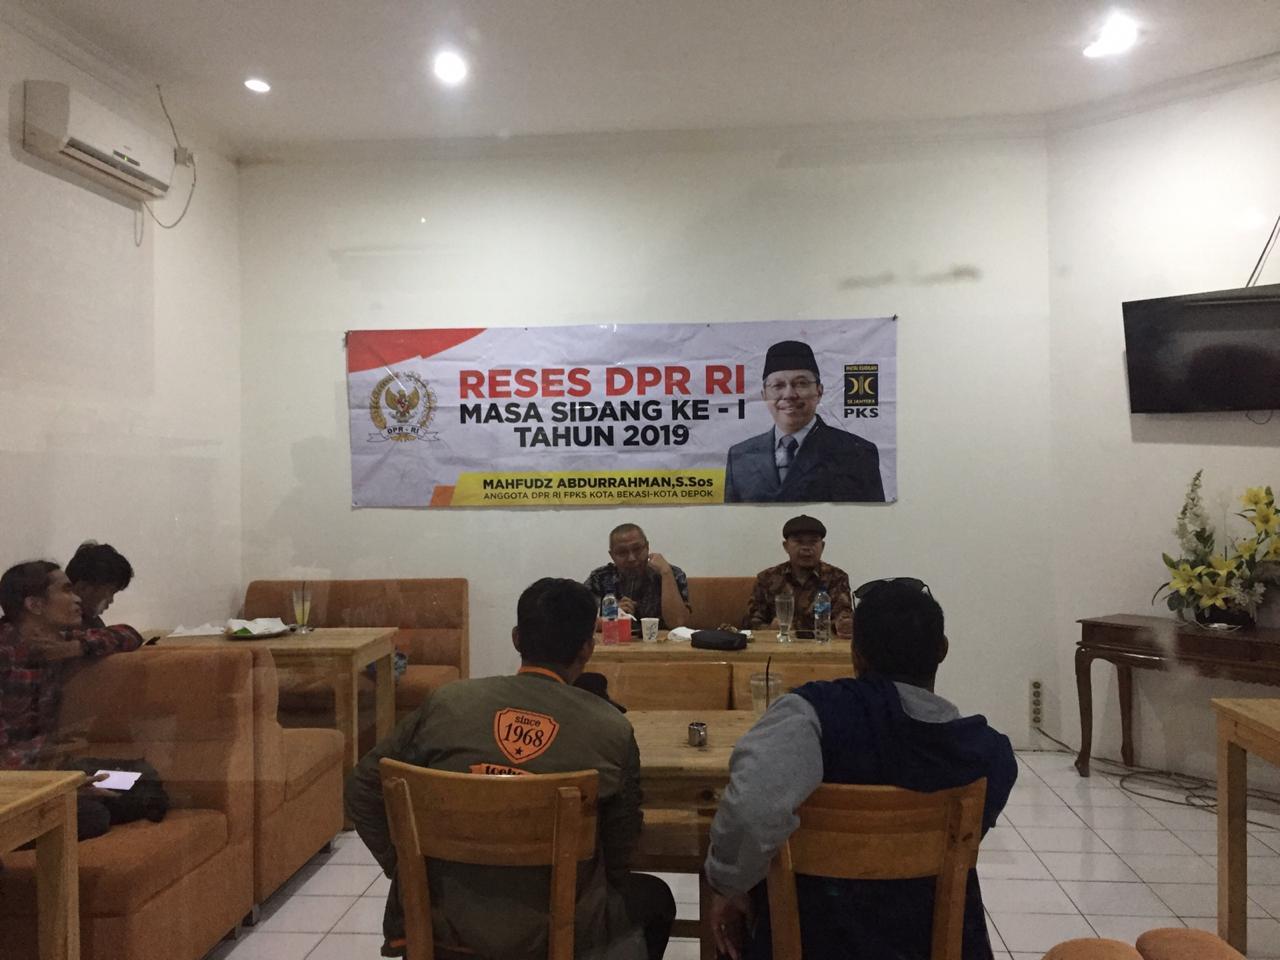 Foto Caption : Anggota DPR RI, Mahfudz Abdurrahman Partai Keadilan Sejahtera (PKS) Jawa Barat, Dapil Kota Bekasi dan Depok, Komisi VI yang fokus meliputi perdagangan, perindustrian, Koperasi, UKM, BUMN, Investasi dan Standarisasi menggelar Reses DPR RI masa sidang ke-1 tahun 2019 ditemani oleh perwakilan Anggota DPRD Kota Bekasi, Saifuddaulah Fraksi PKS yang berlokasi di Bakoel Sangu. (Nil/Fotografer).